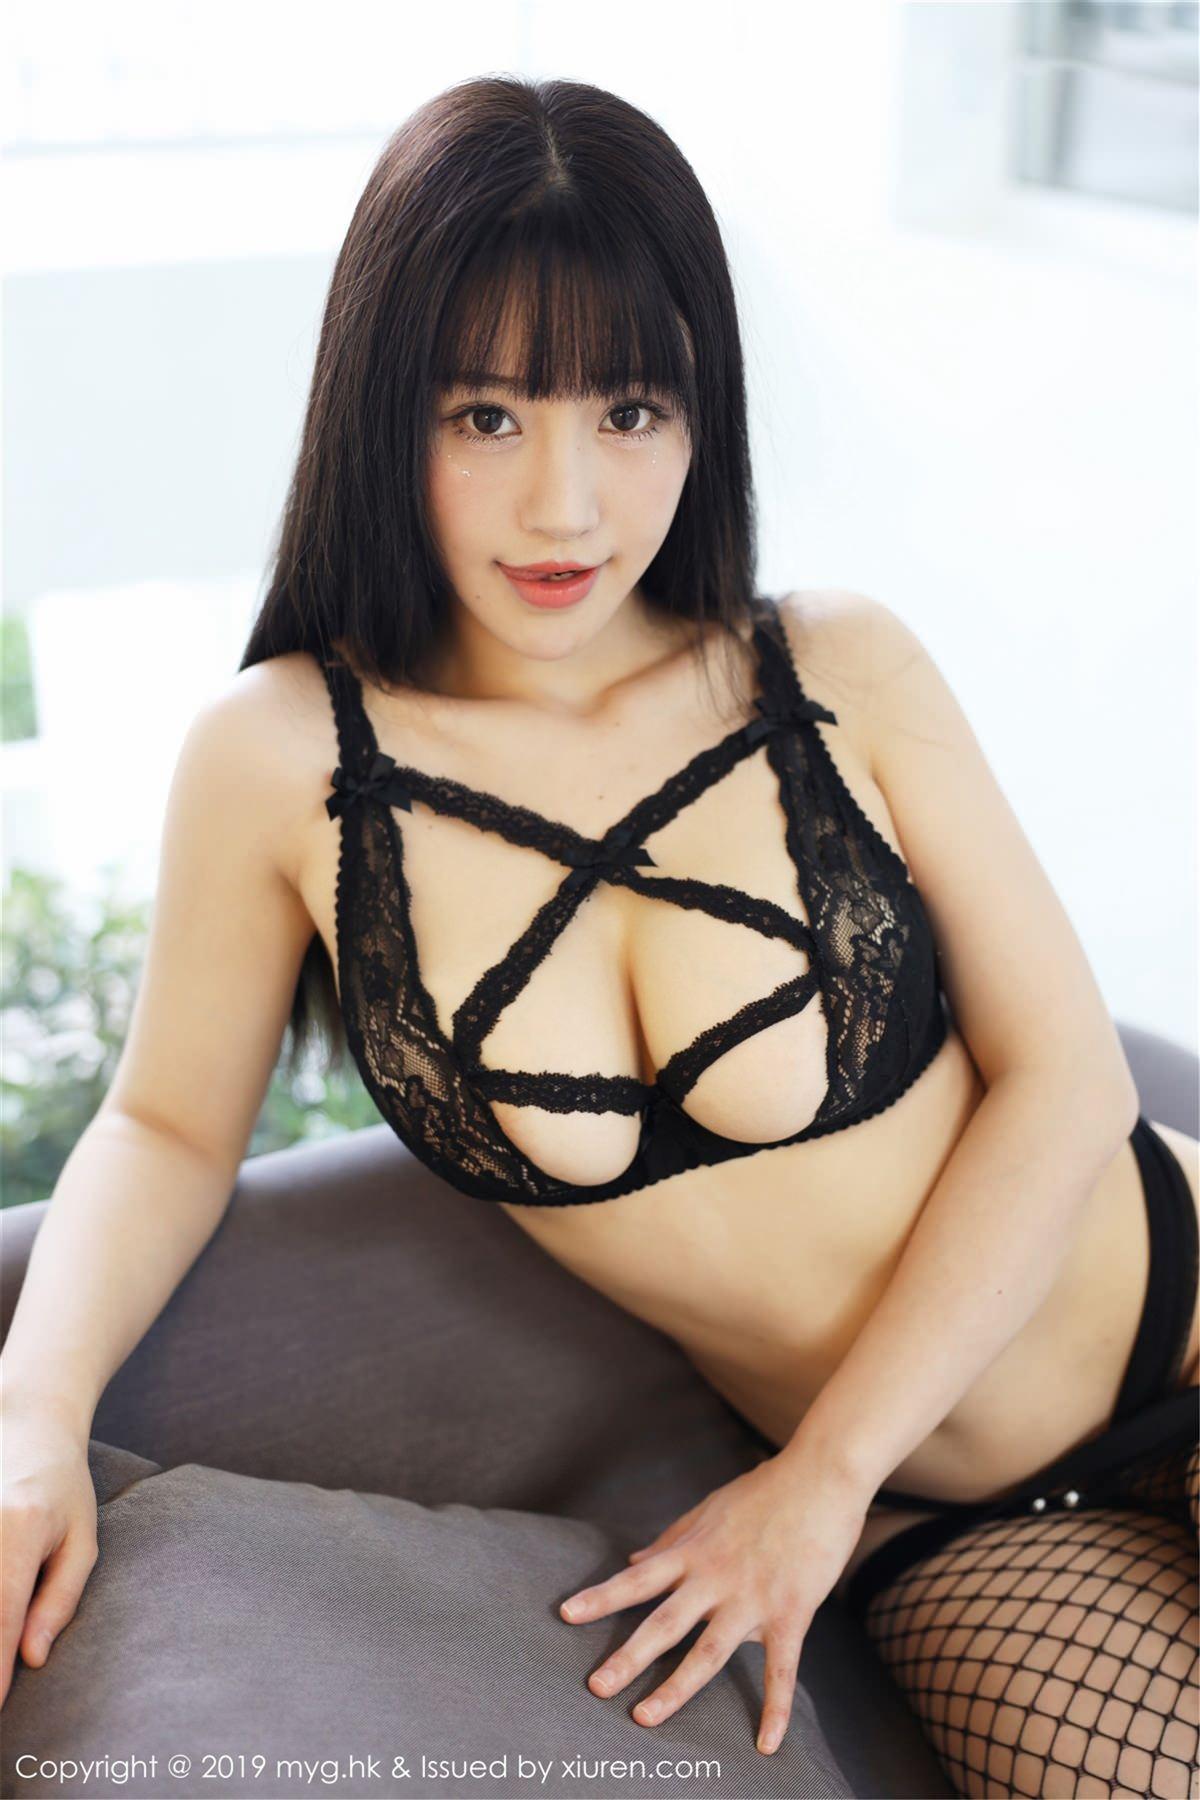 MyGirl Vol.357 69P, mygirl, Zhu Ke Er